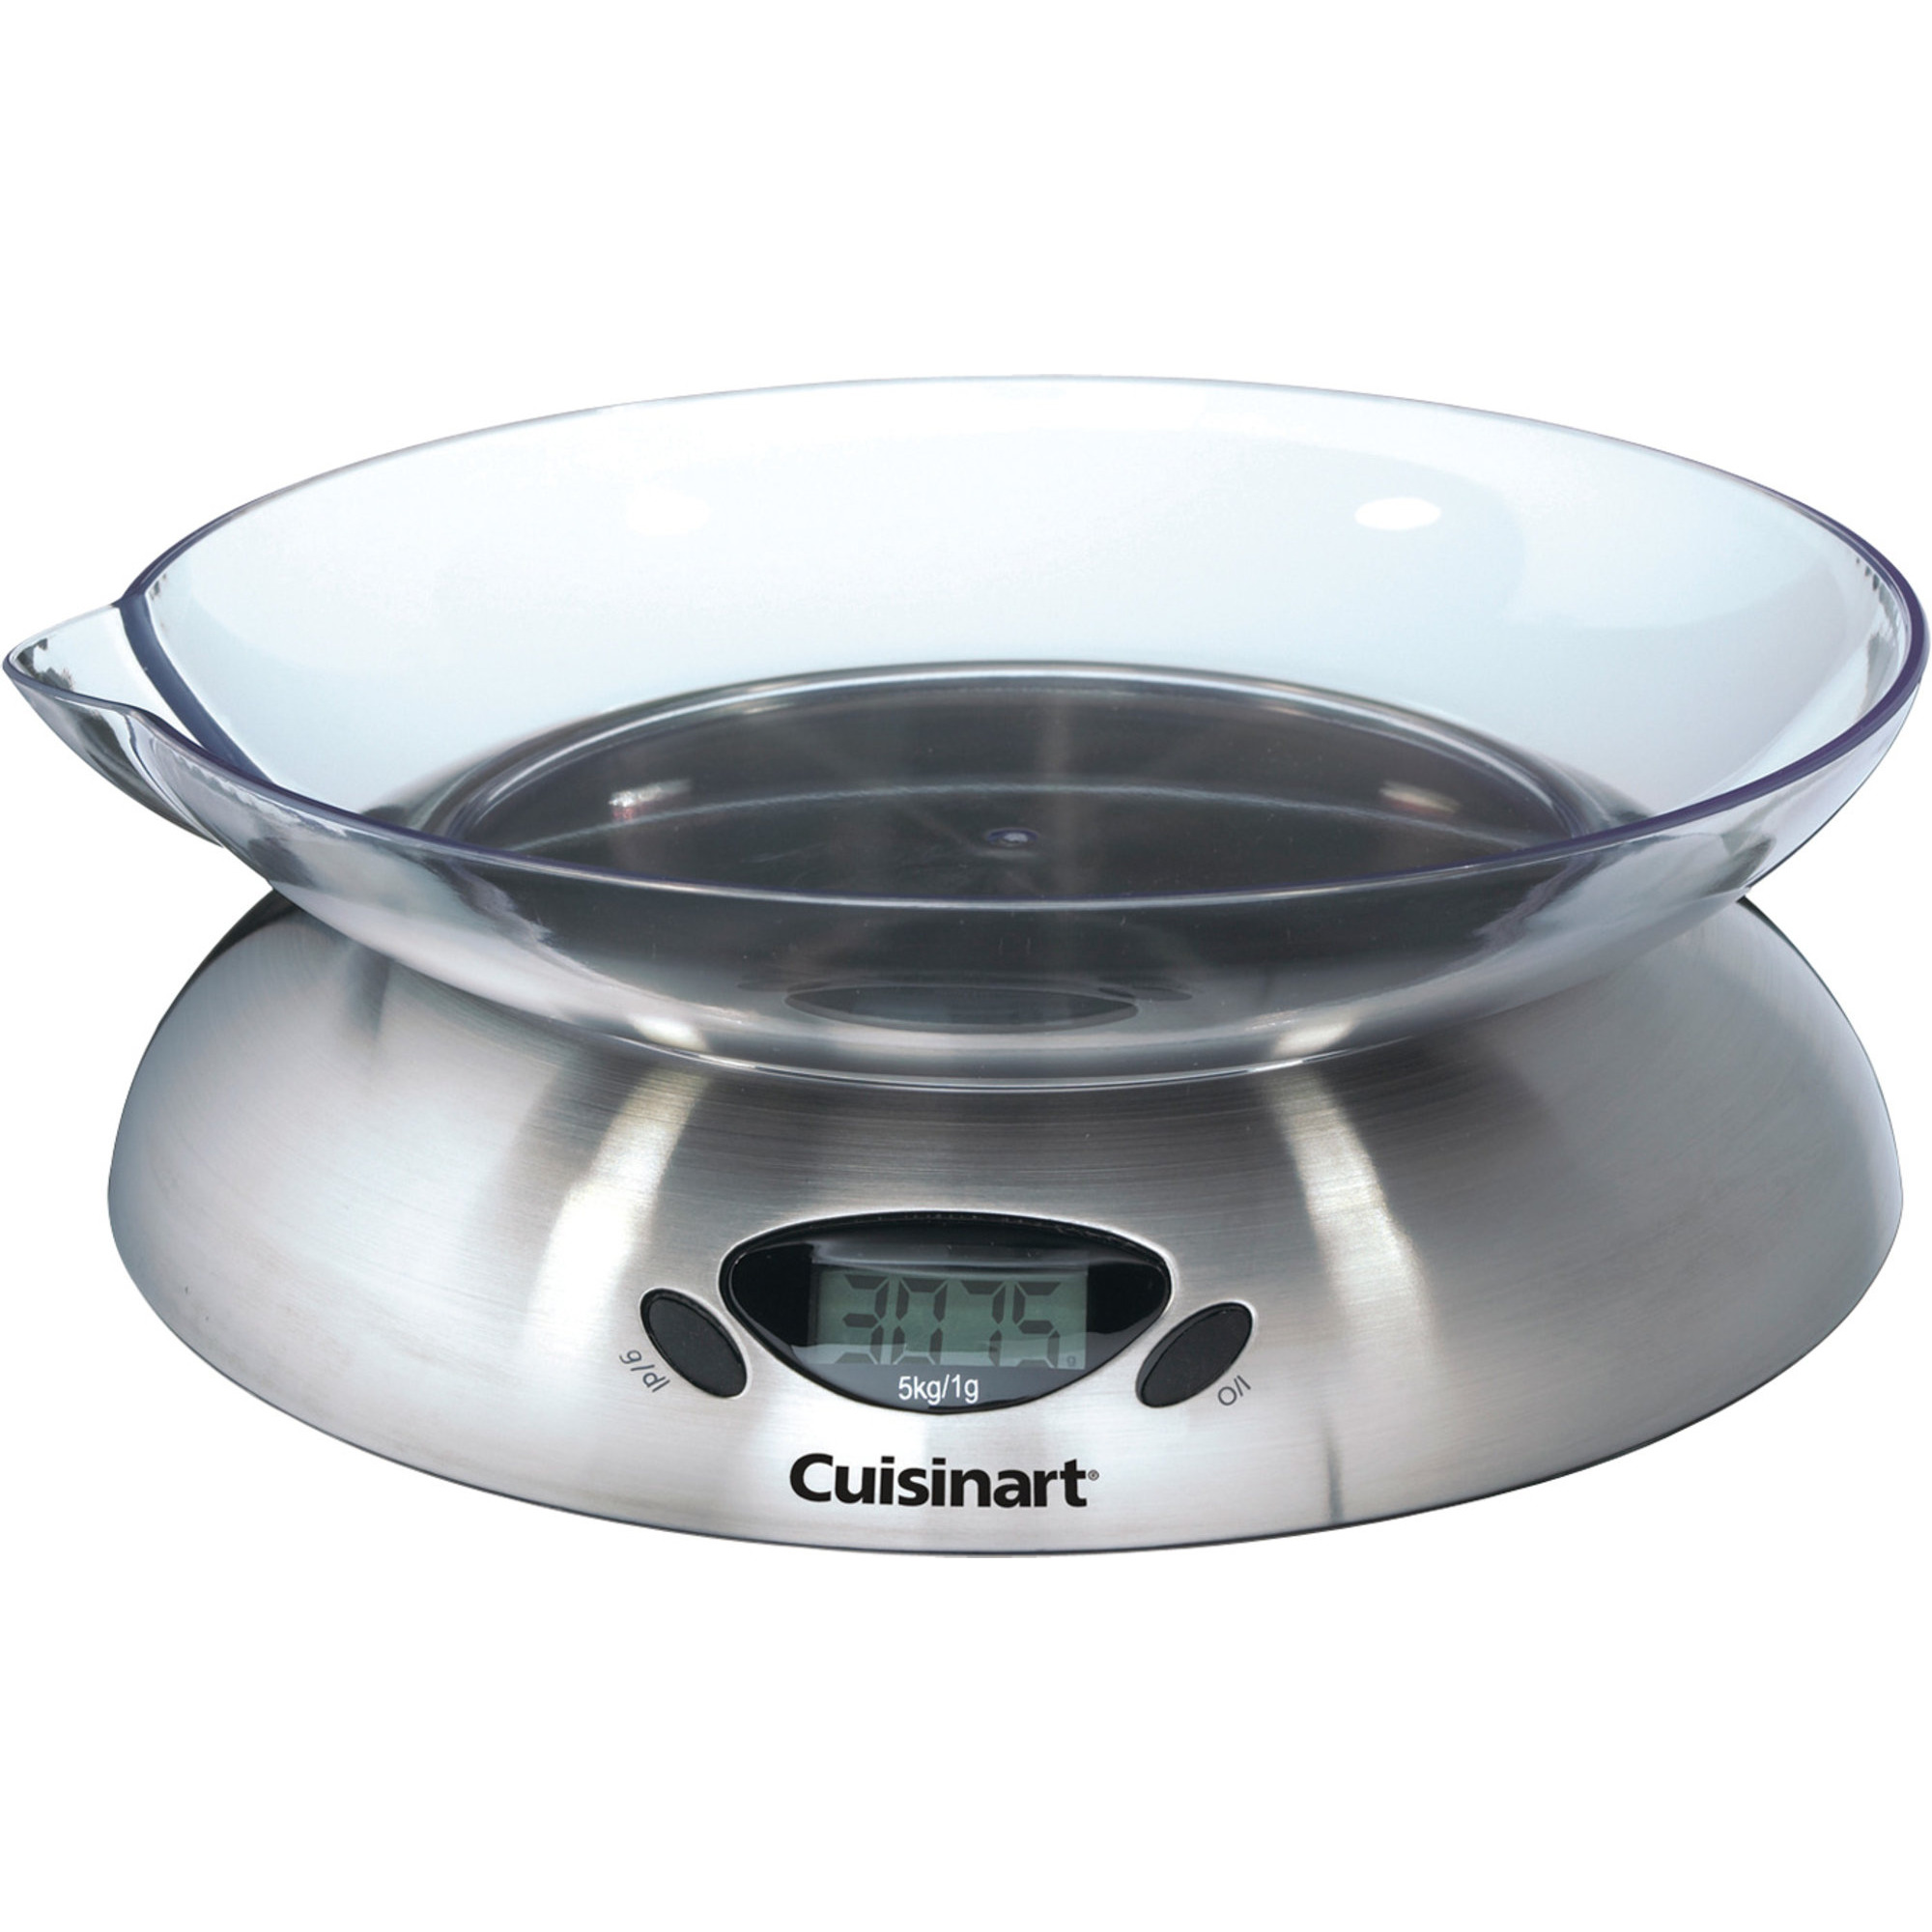 Cuisinart Elektrisk Köksvåg 0-5 kg